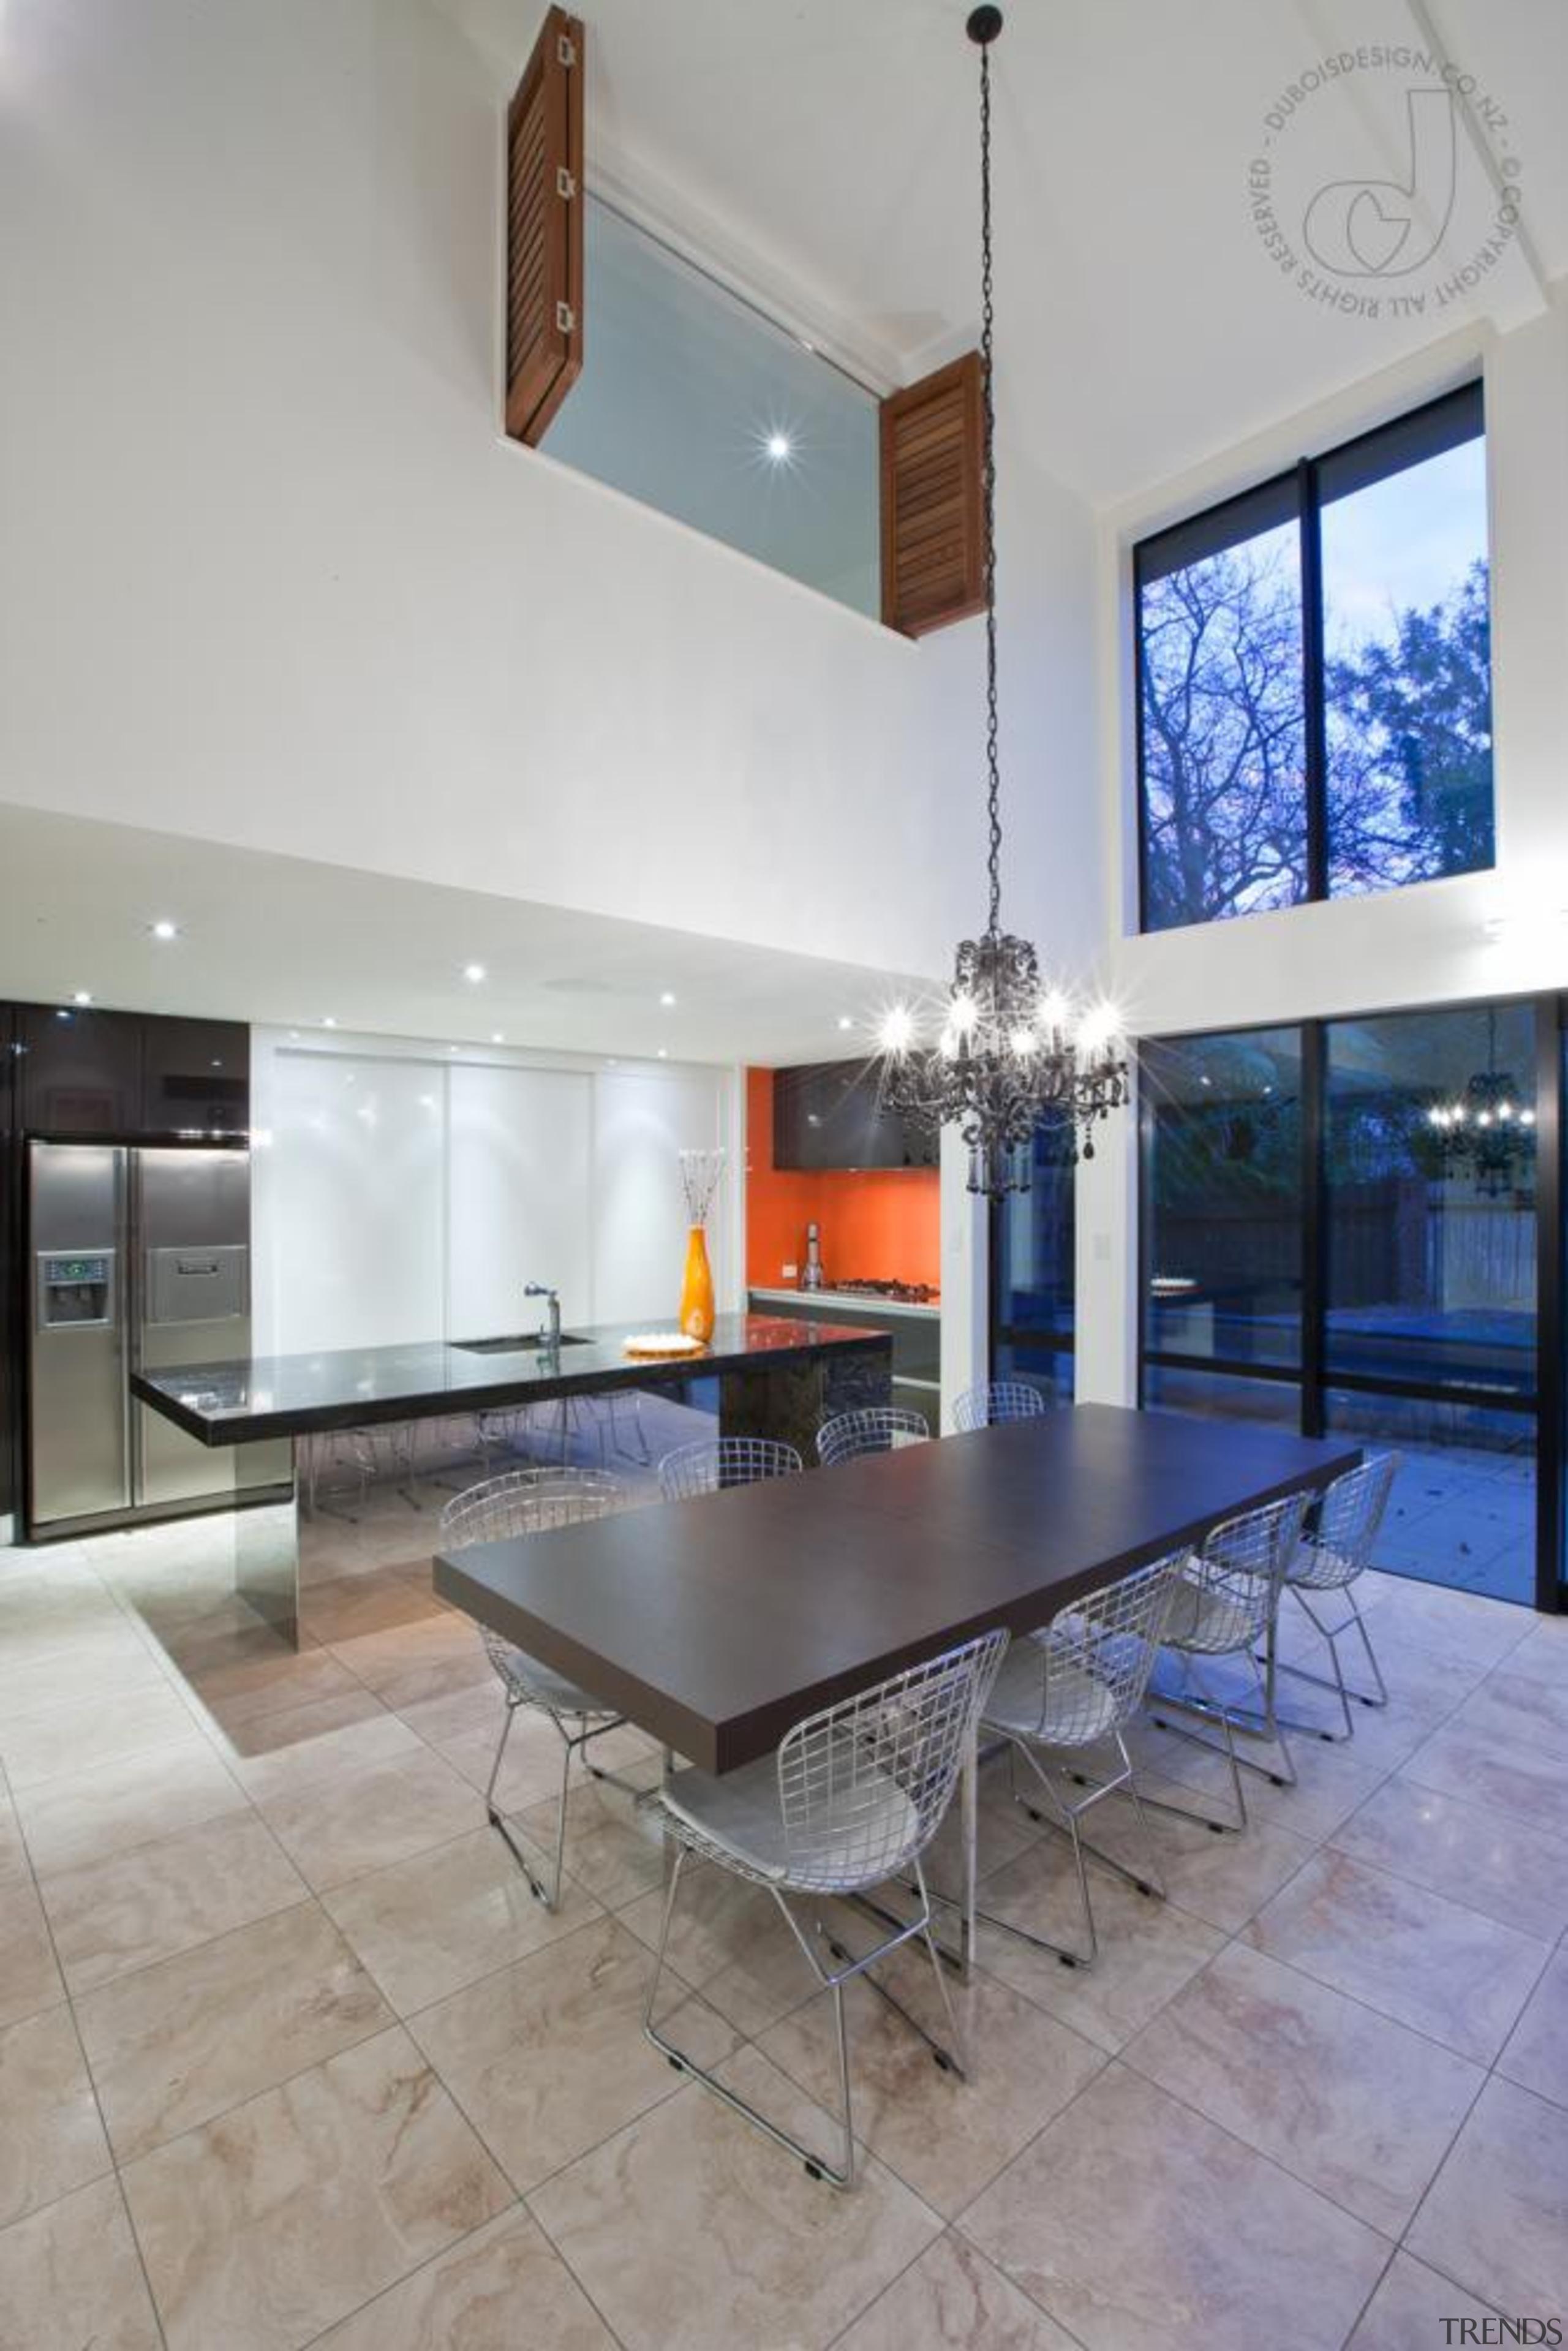 Simplistic Kitchen - Simplistic Kitchen - architecture | architecture, ceiling, countertop, floor, house, interior design, living room, real estate, table, gray